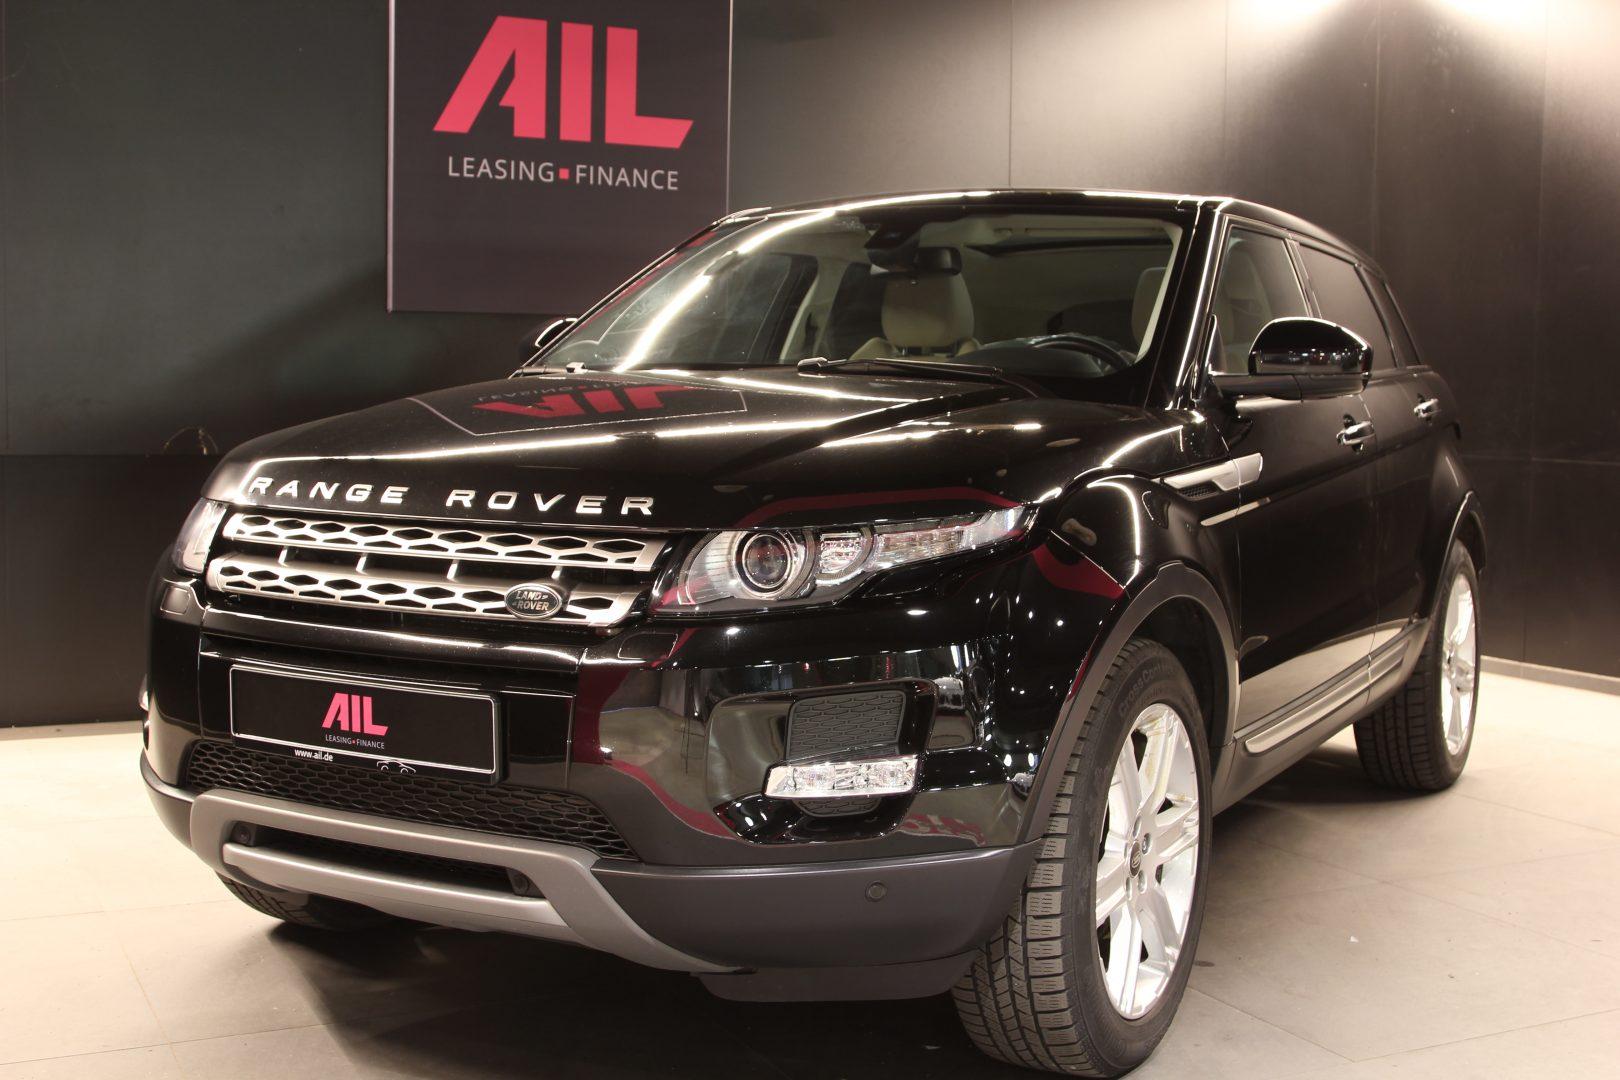 AIL Land Rover Range Rover Evoque Prestige 12